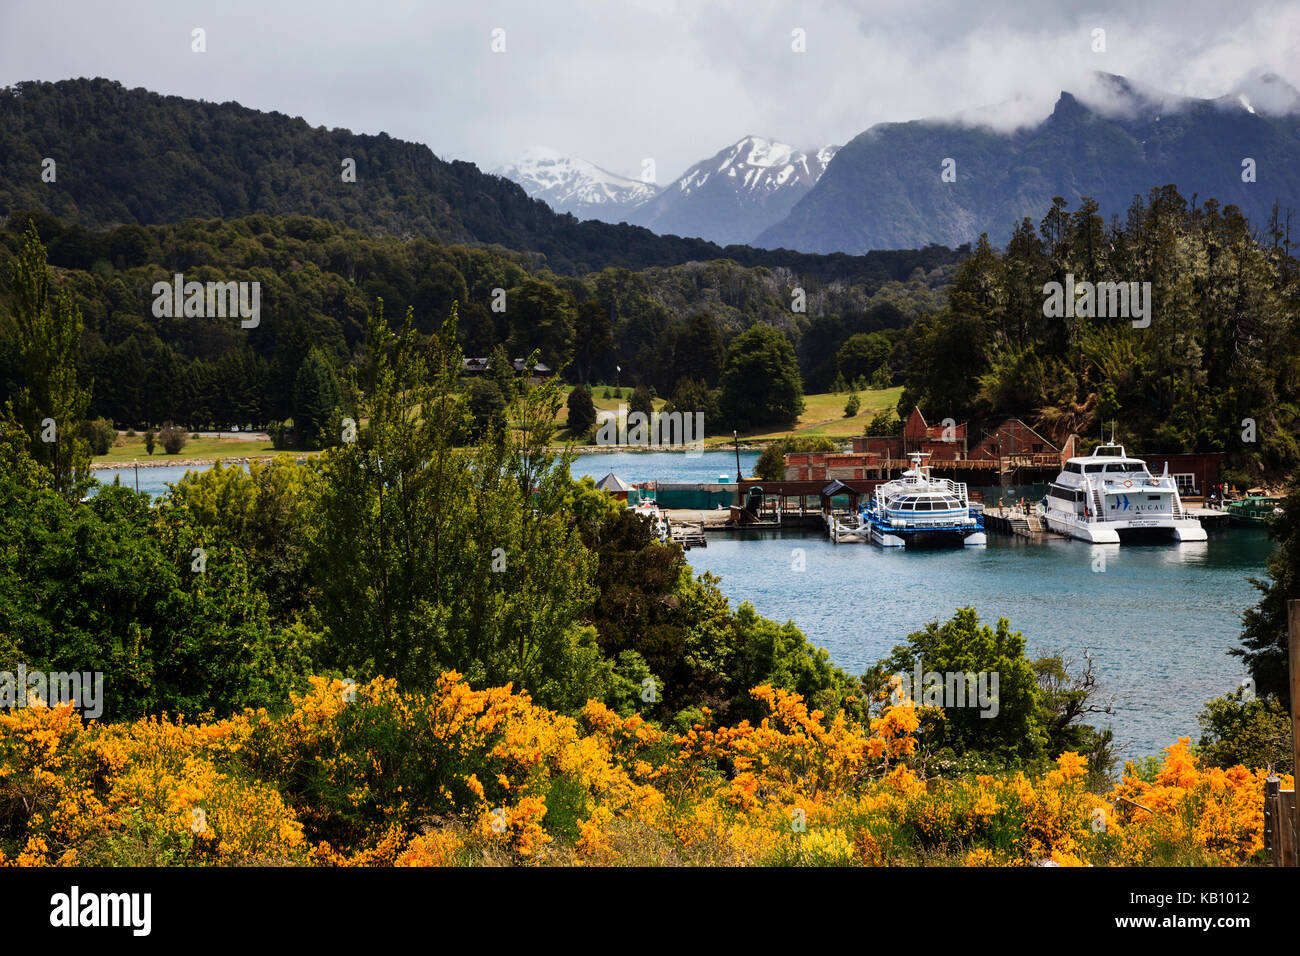 Lake Nahuel Huapi, Parque Nacional Nahuel Huapi National Park, lake region, Llao Llao near Bariloche, Patagonia, - Stock Image